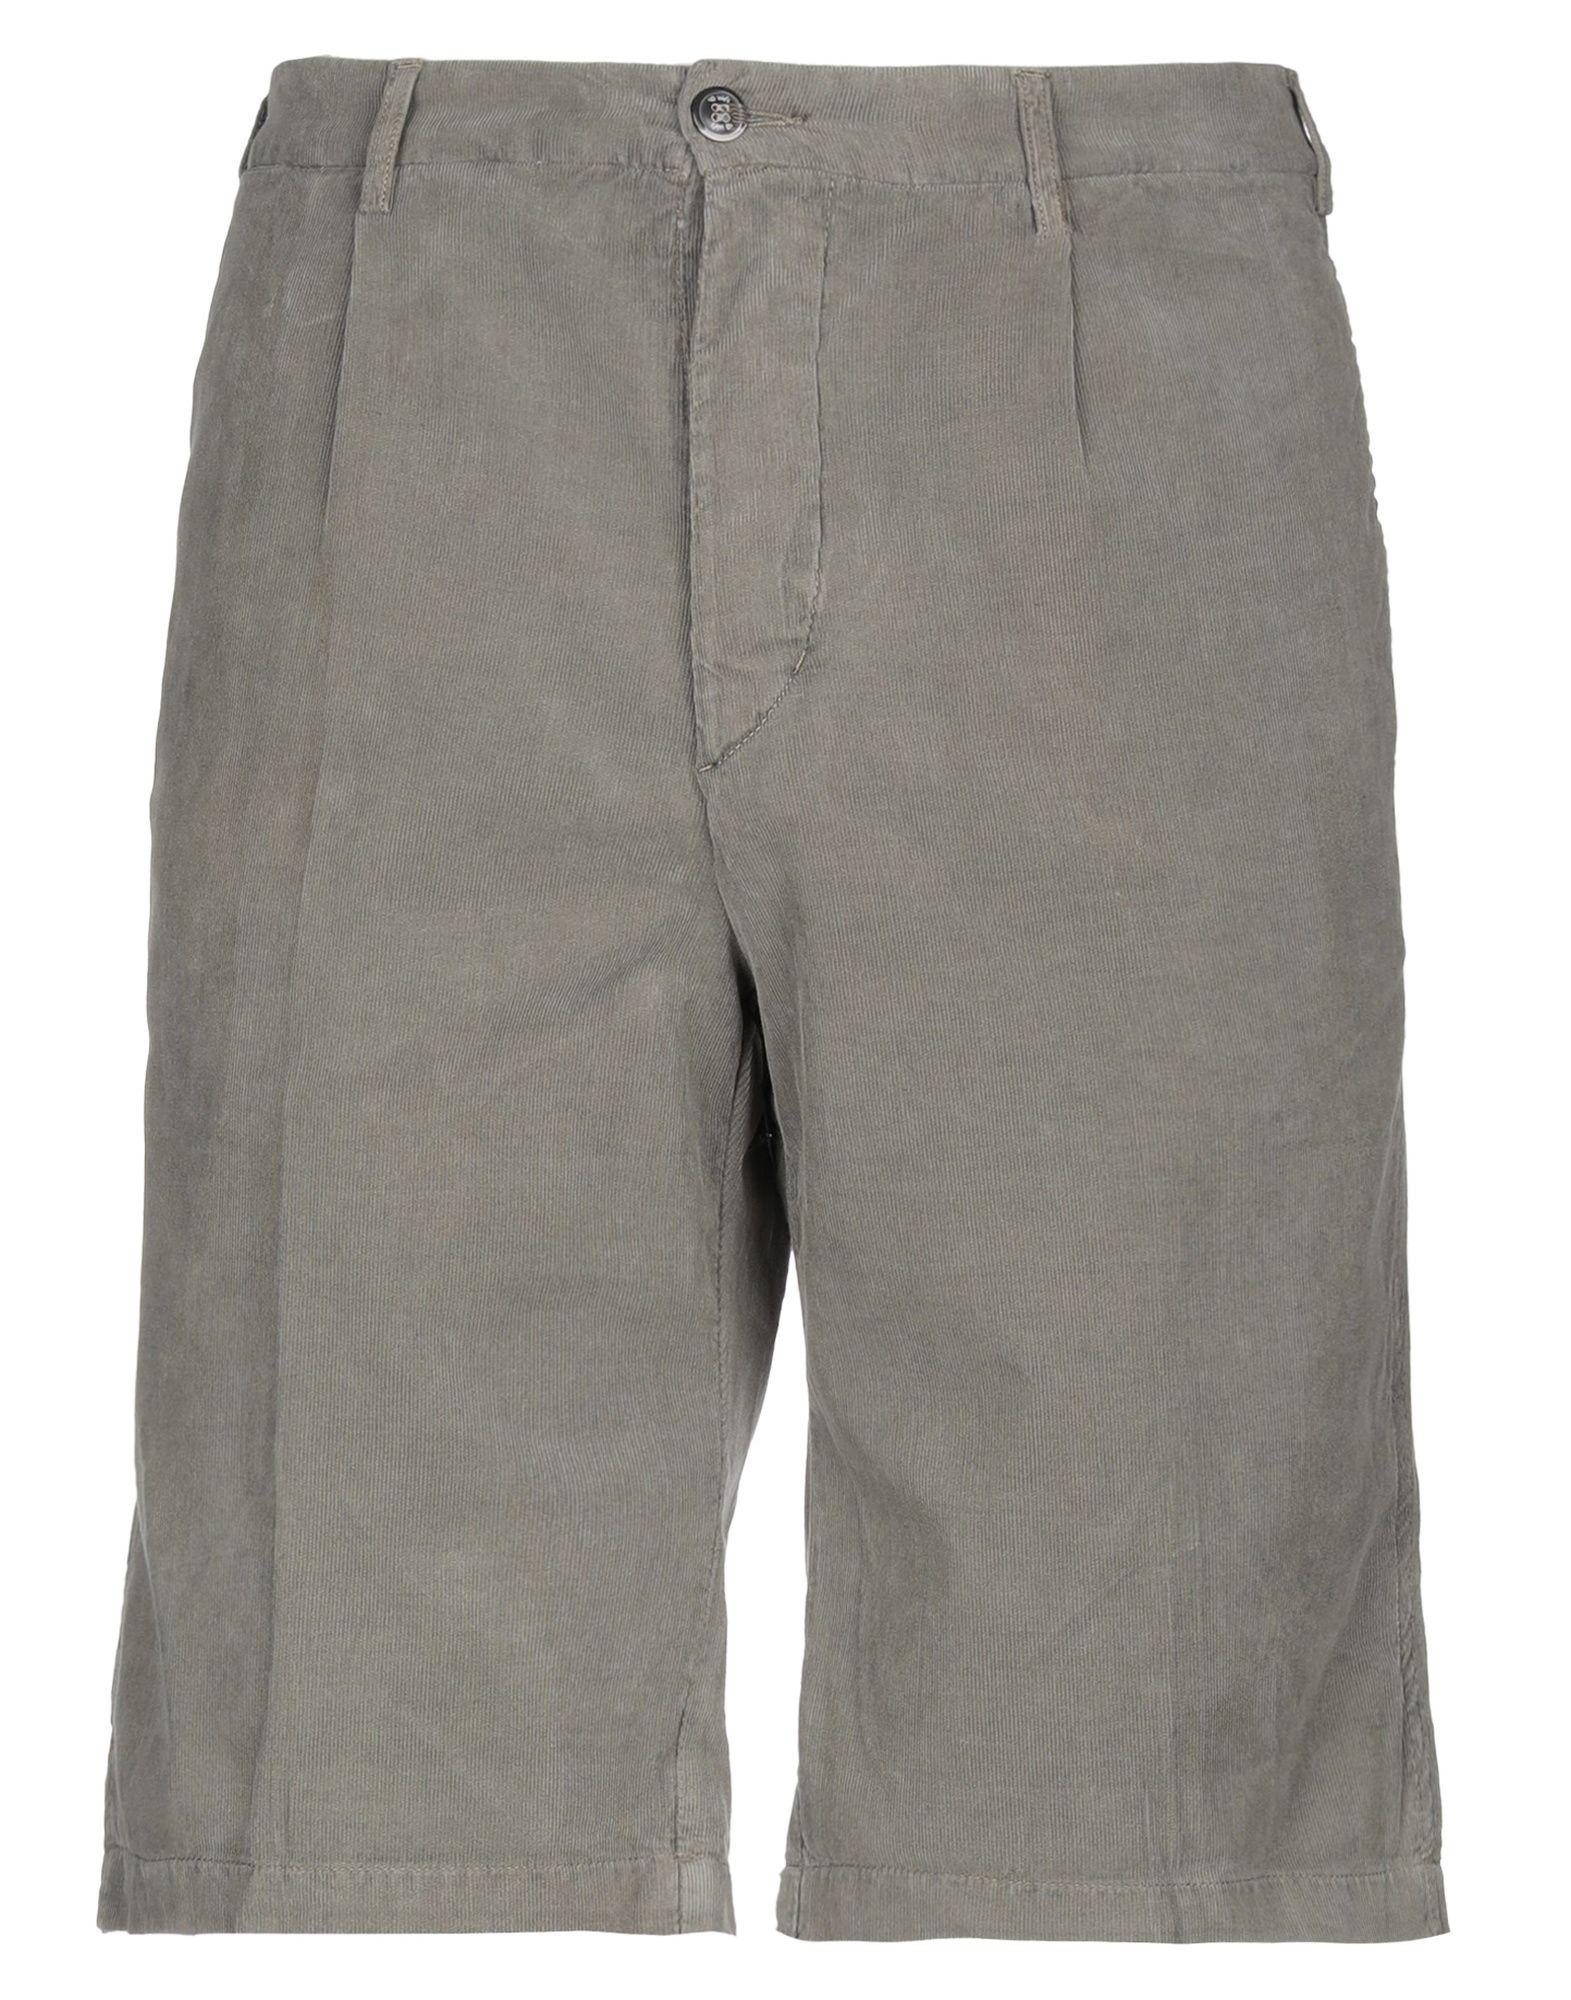 Shorts Shorts & Bermuda 40Weft uomo - 13277456DJ  Factory Outlets